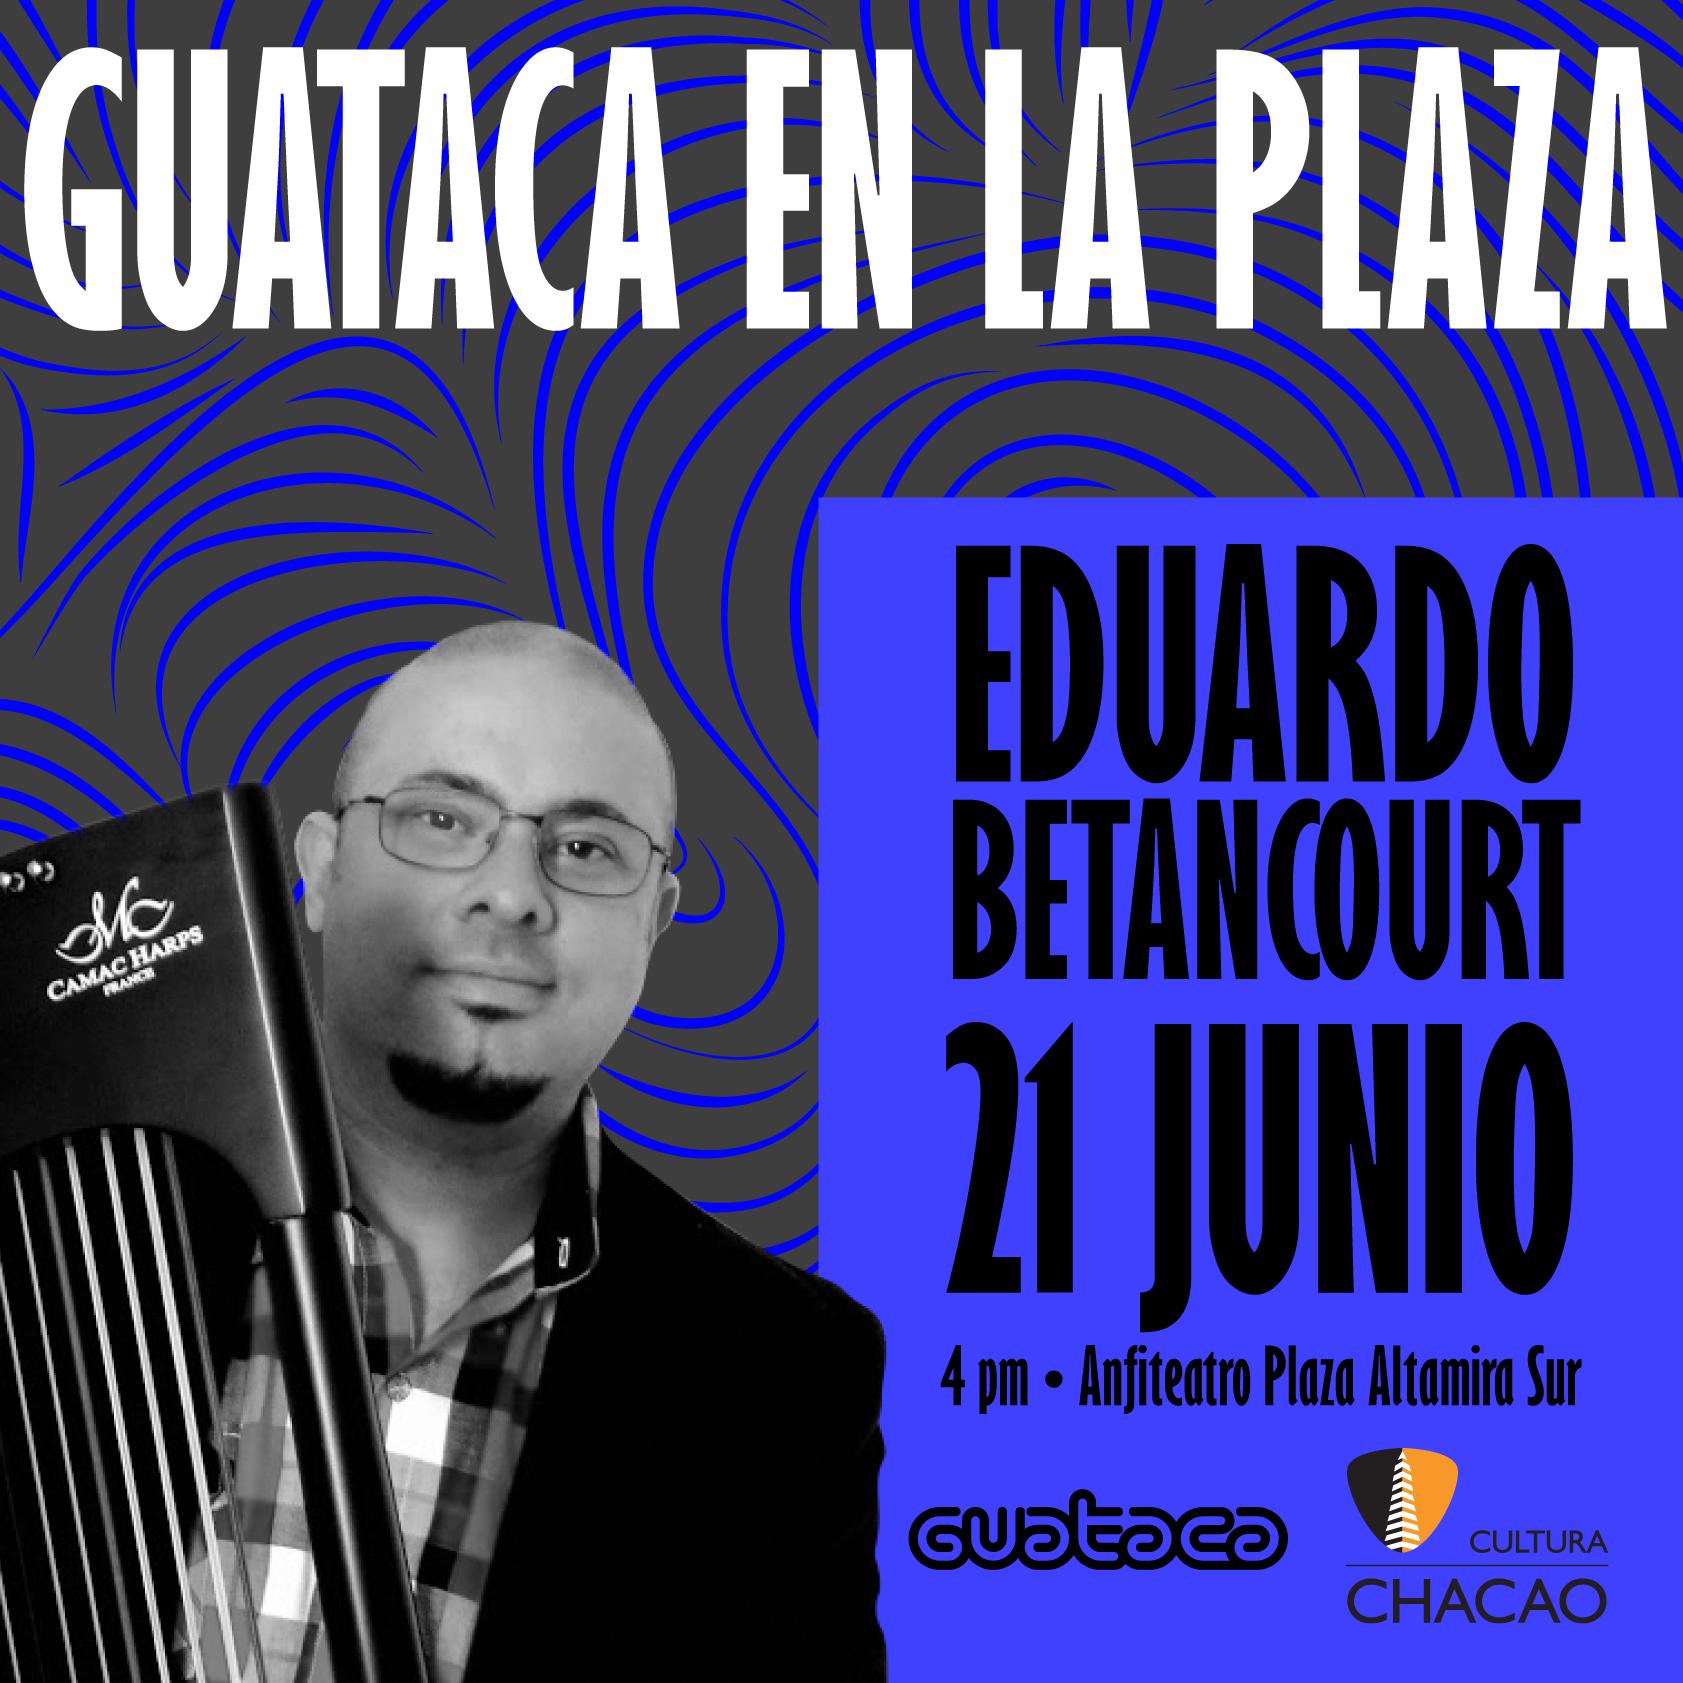 GUATACA-EN-PLAZA-EDUARDO-B-INSTAGRAM